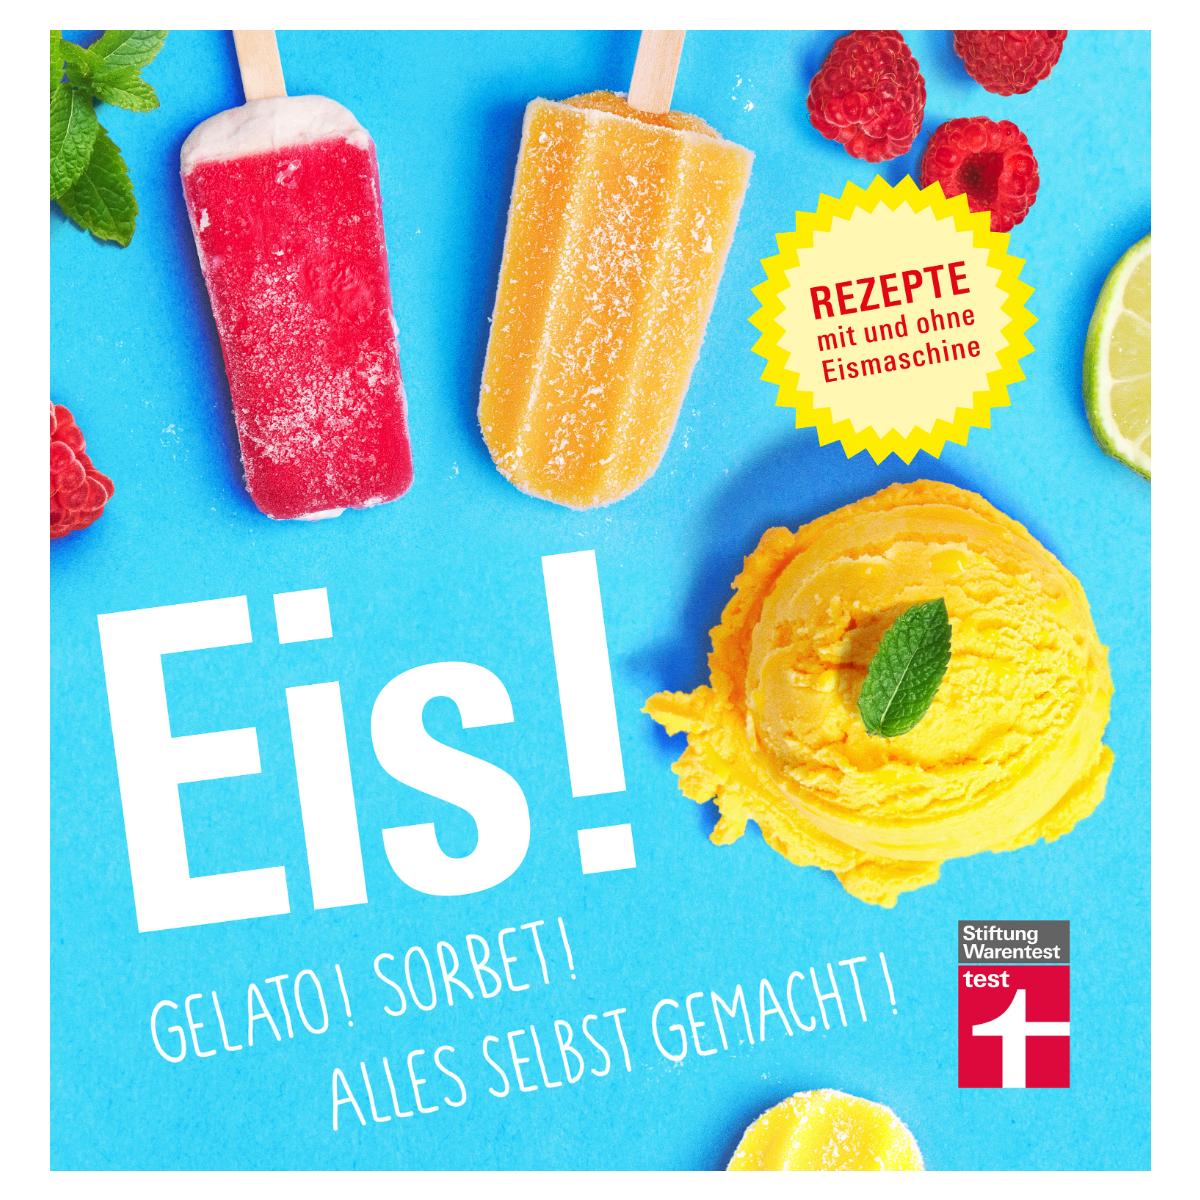 eis_gelato_sorbet_Kochbuch_cover